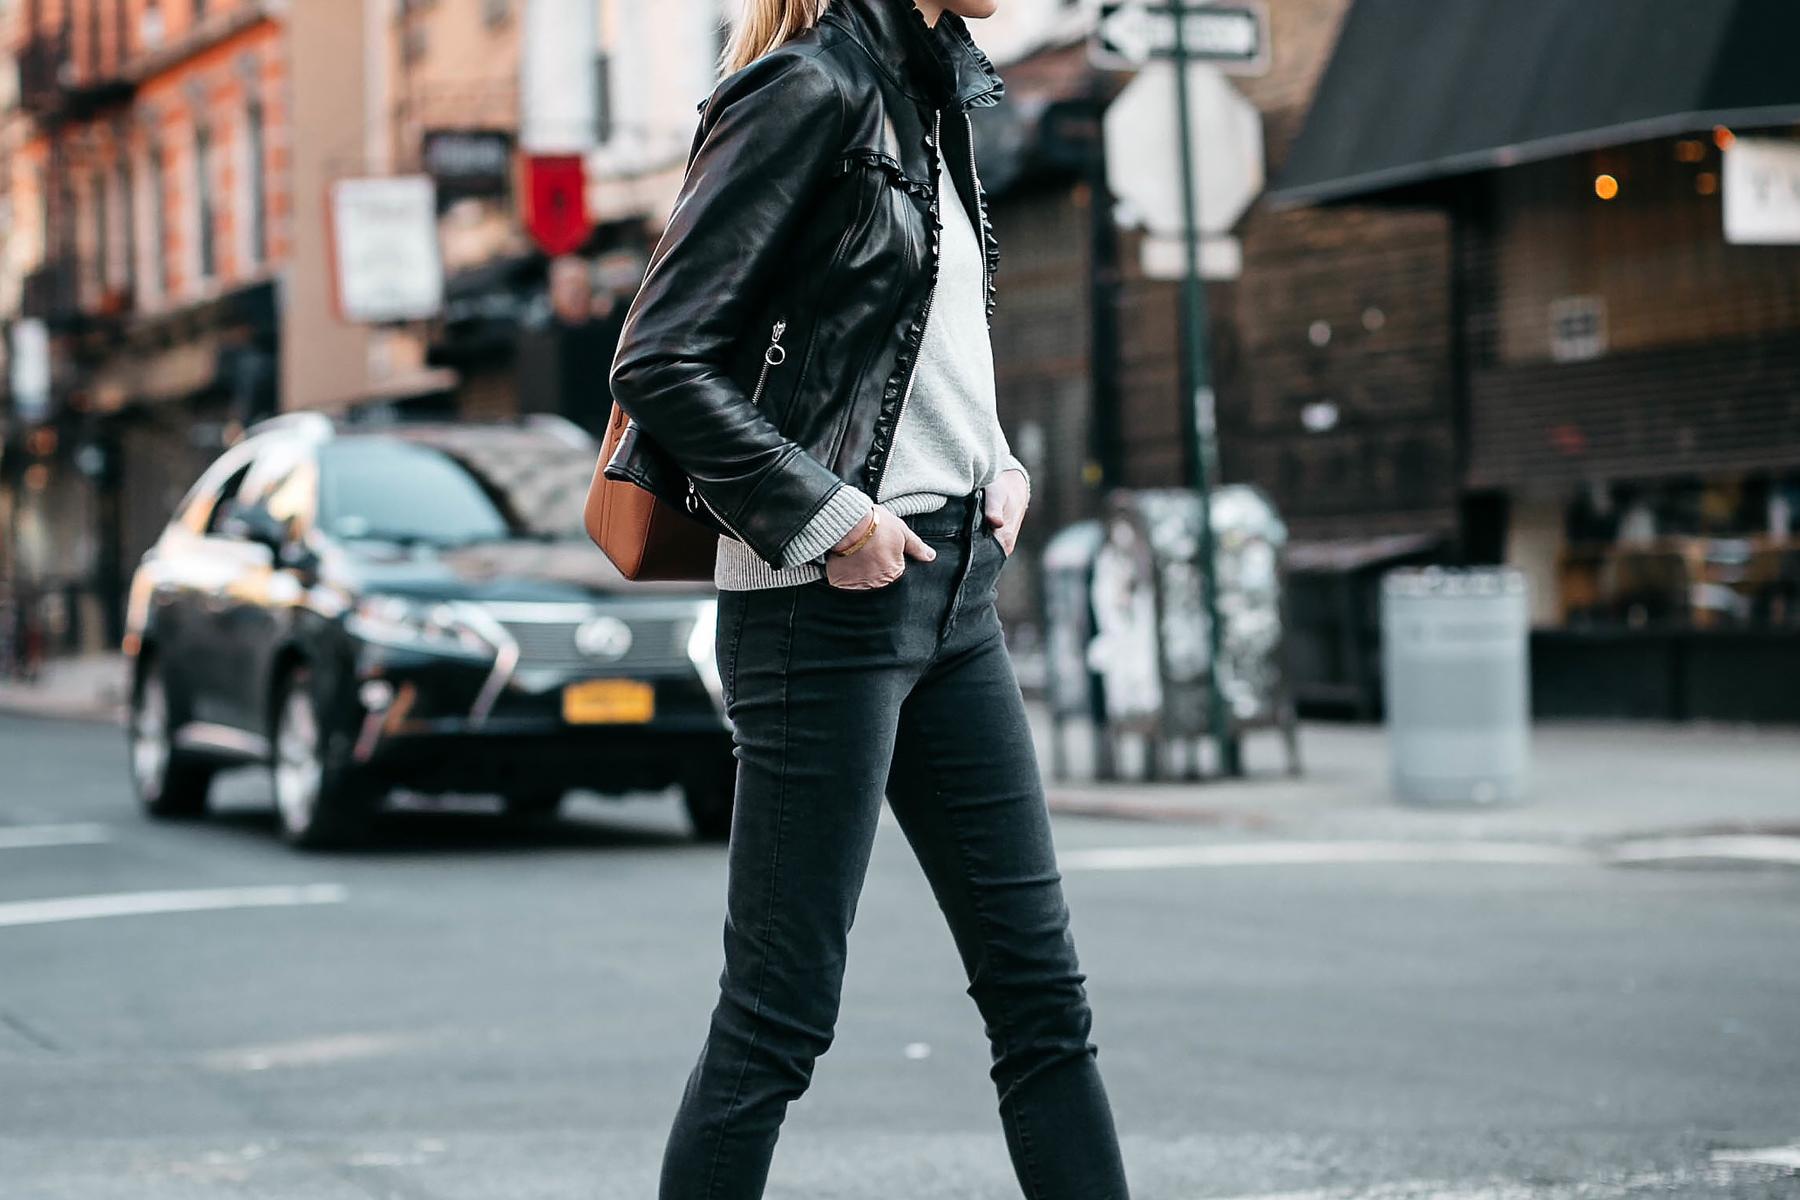 Woman Wearing Ann Taylor Black Leather Jacket Grey Sweater Black Skinny Jeans Fashion Jackson Dallas Blogger Fashion Blogger Street Style New York Fashion Week